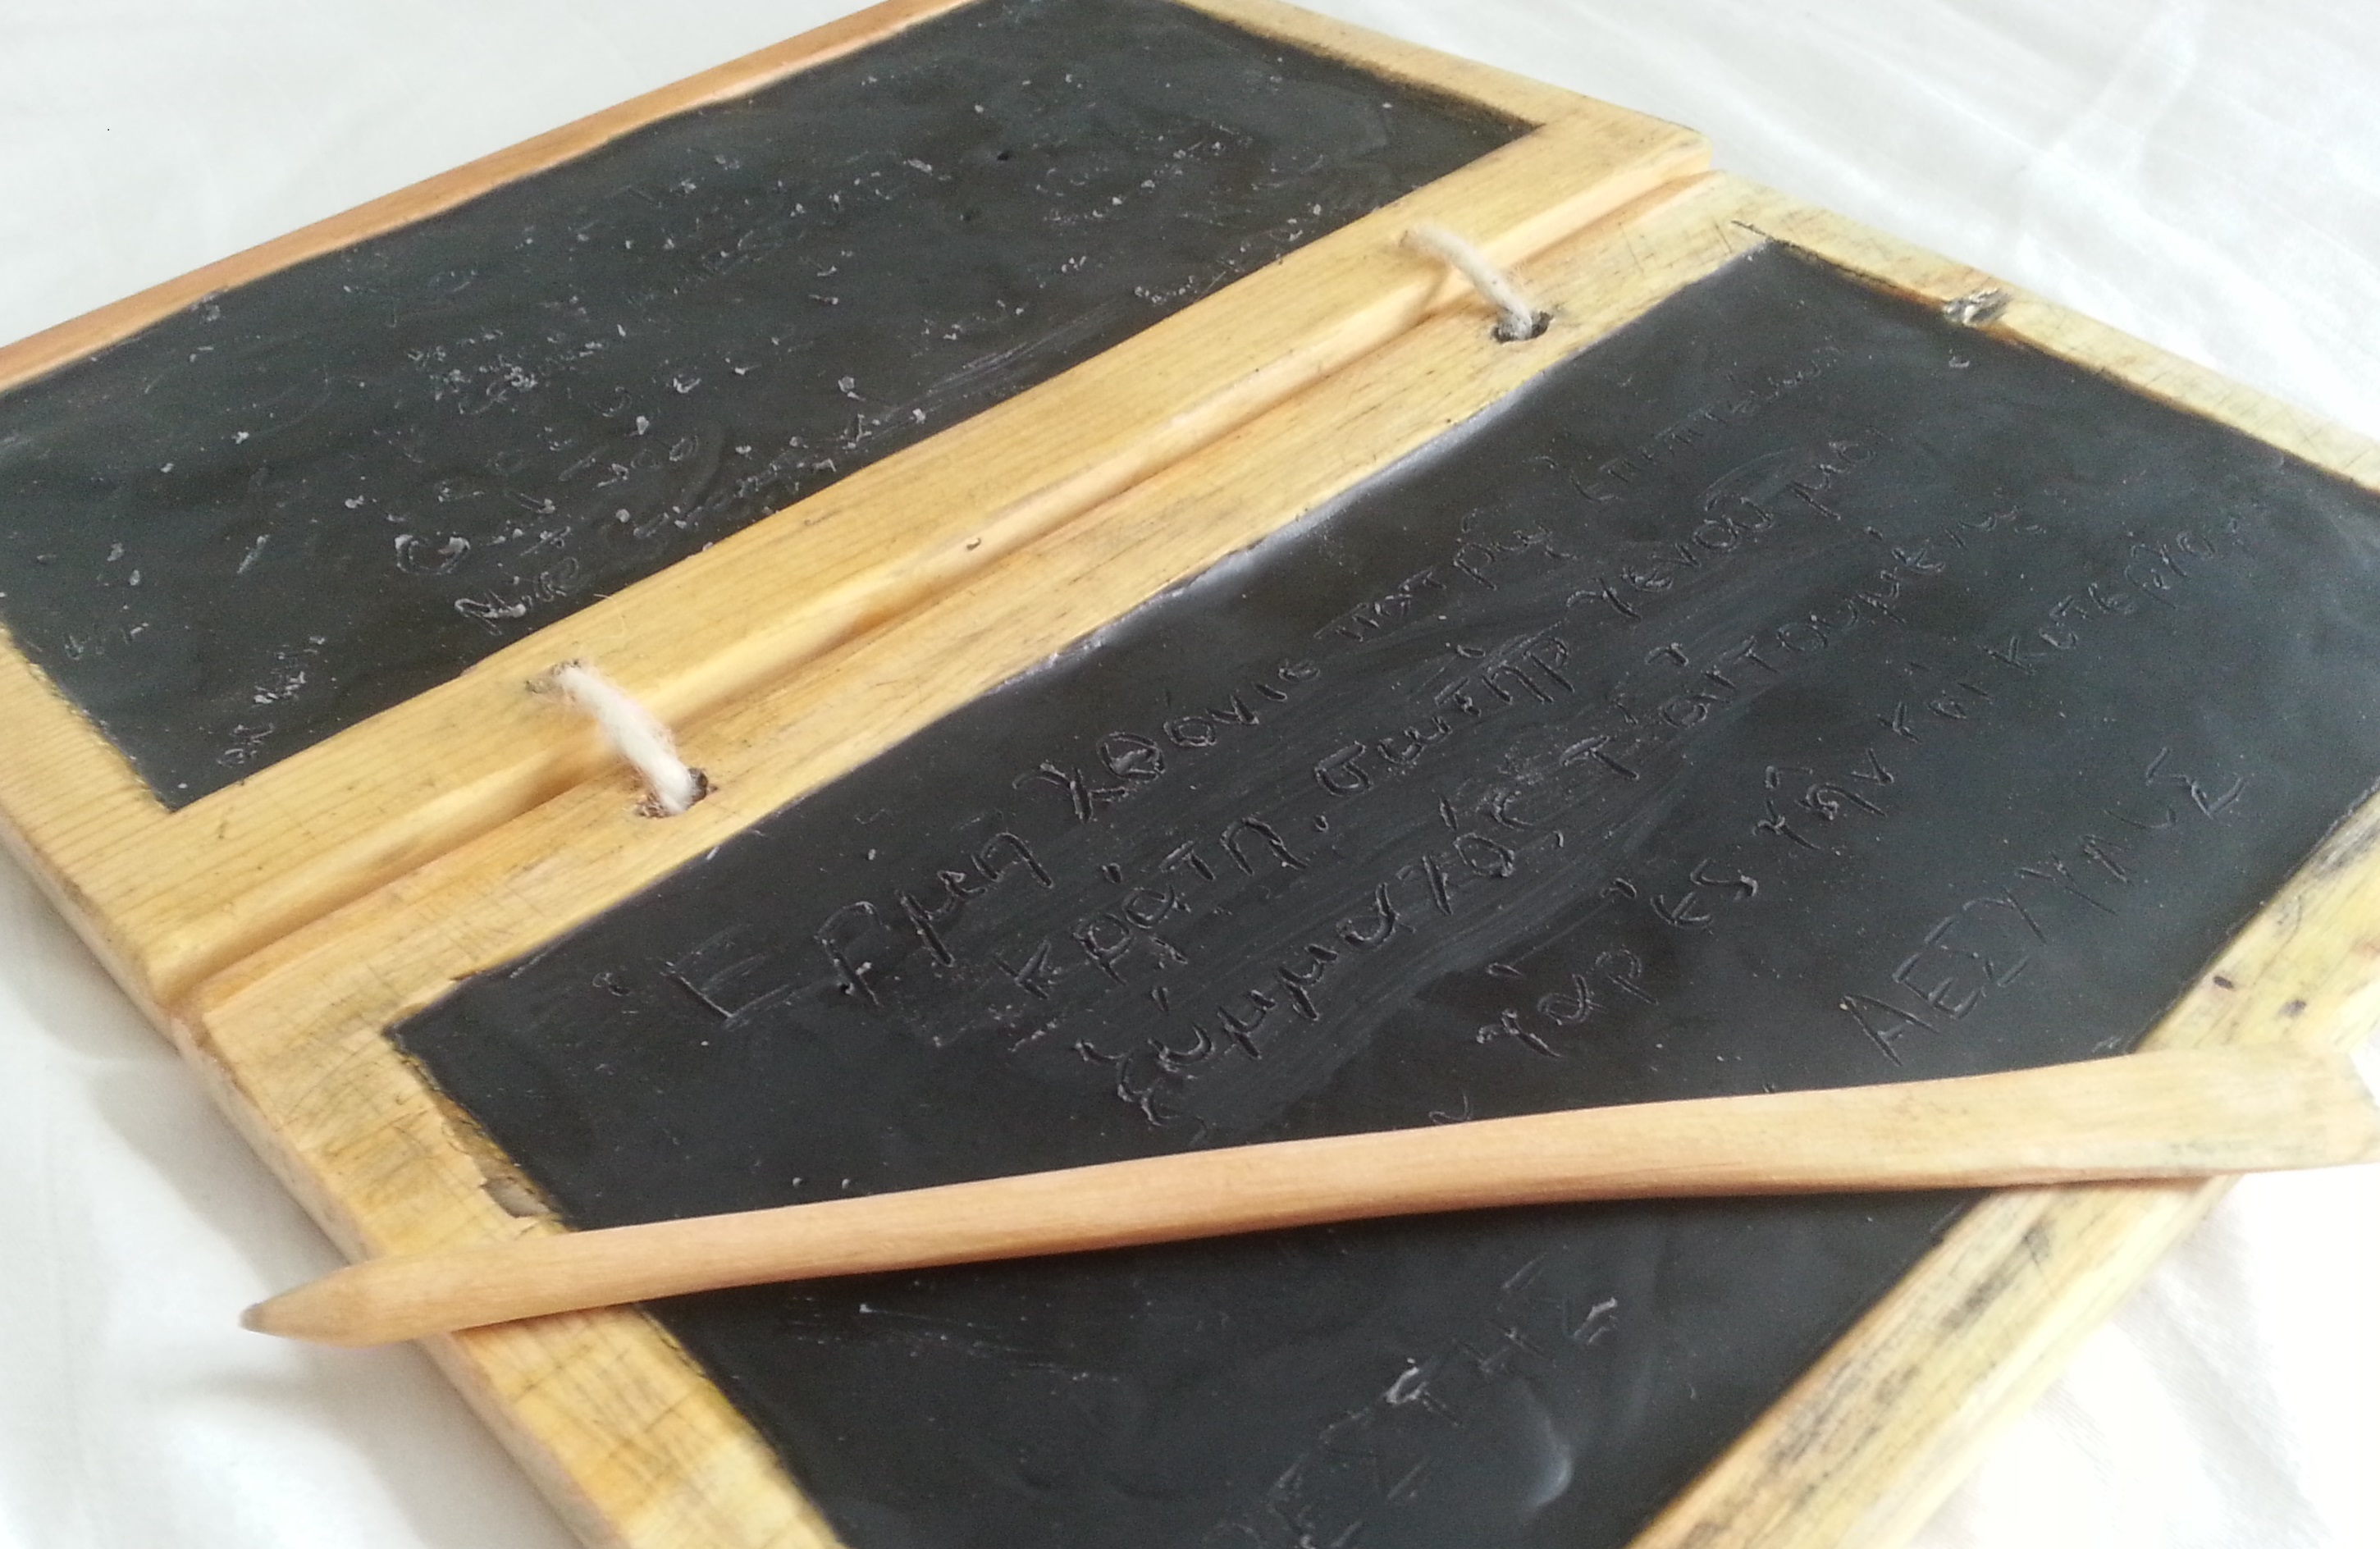 The original iPad: Diptych